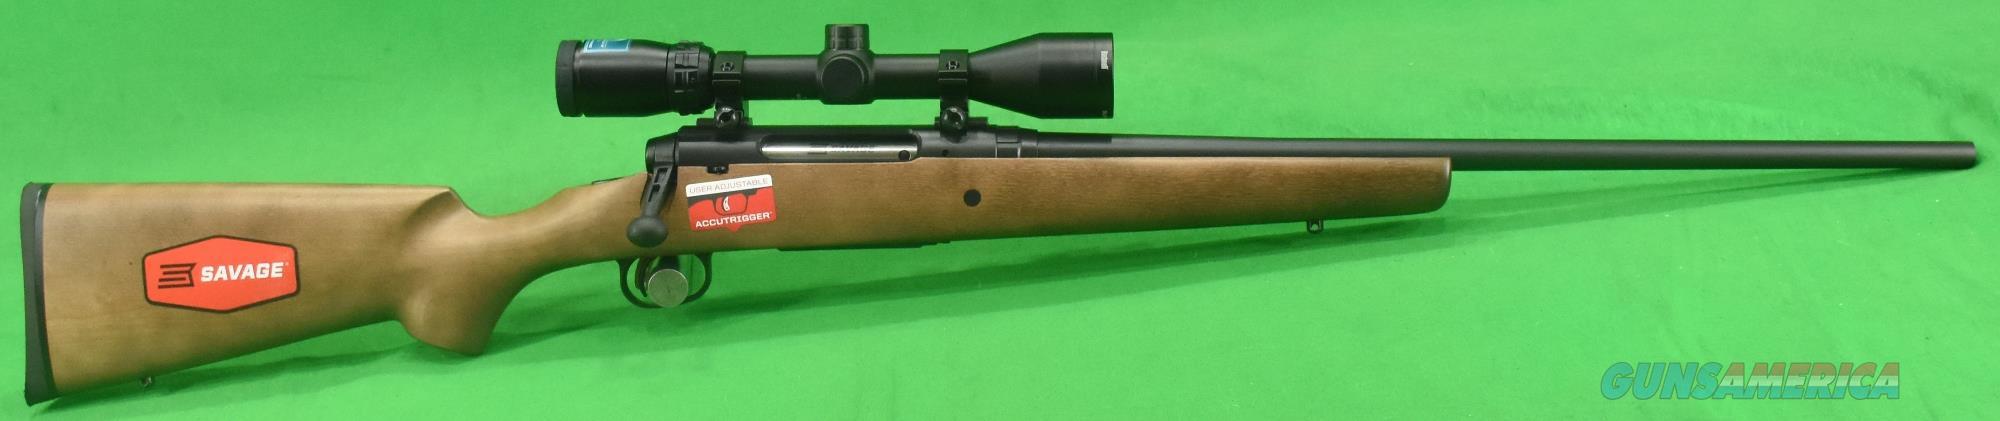 Axis II XP Hardwood 30-06 22In  22556  Guns > Rifles > Savage Rifles > Axis